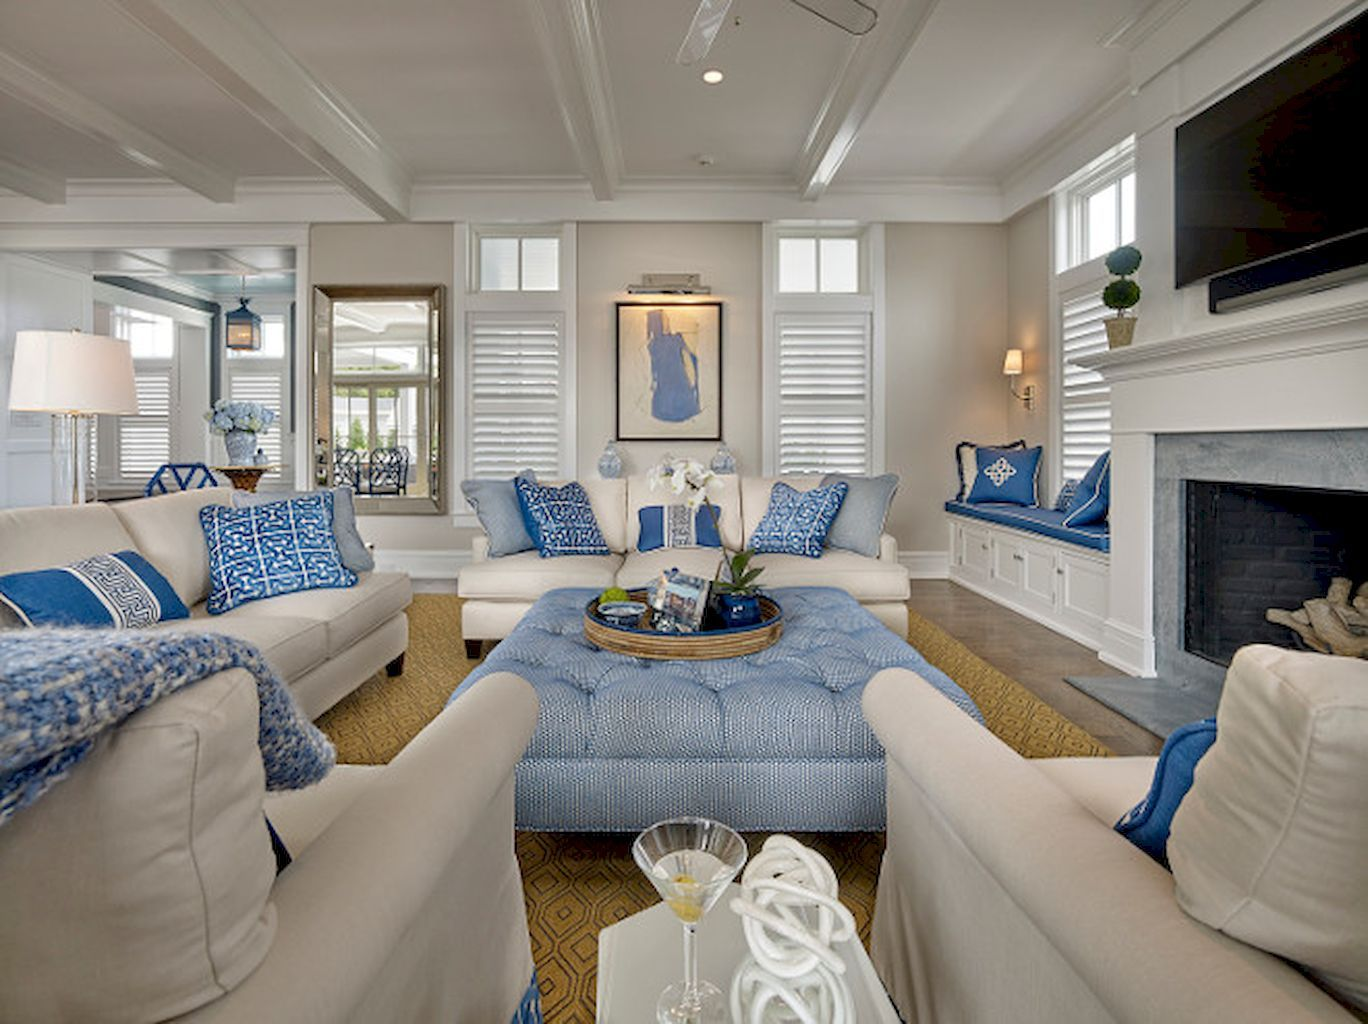 Gorgeous 99 Cozy and Eye-catching Coastal Living Room Decor Ideas https://homstuff.com/2017/07/13/99-cozy-eye-catching-coastal-living-room-decor-ideas/